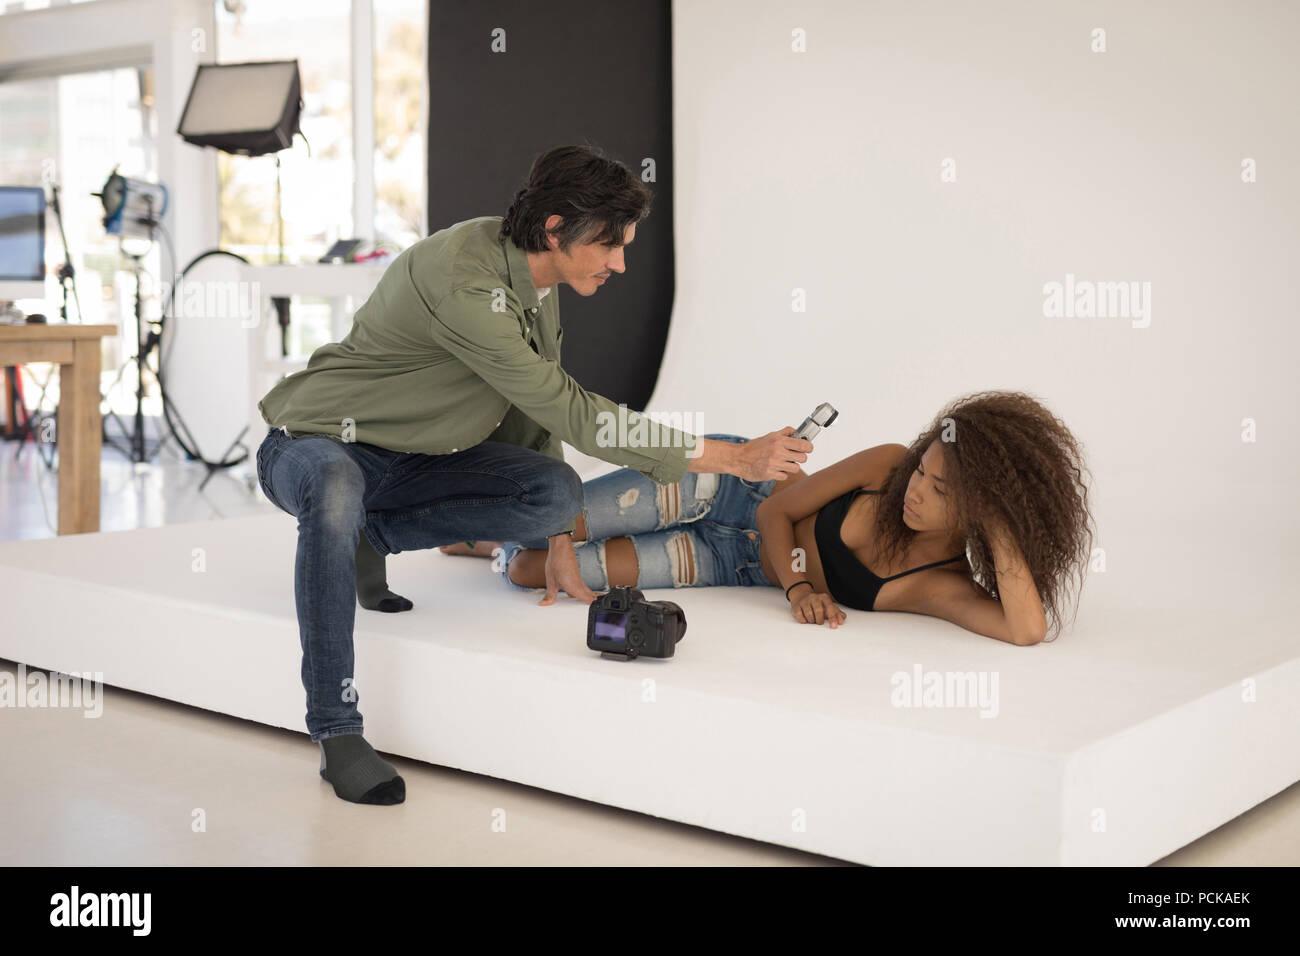 Photographer measuring light with light meter on female model Stock Photo